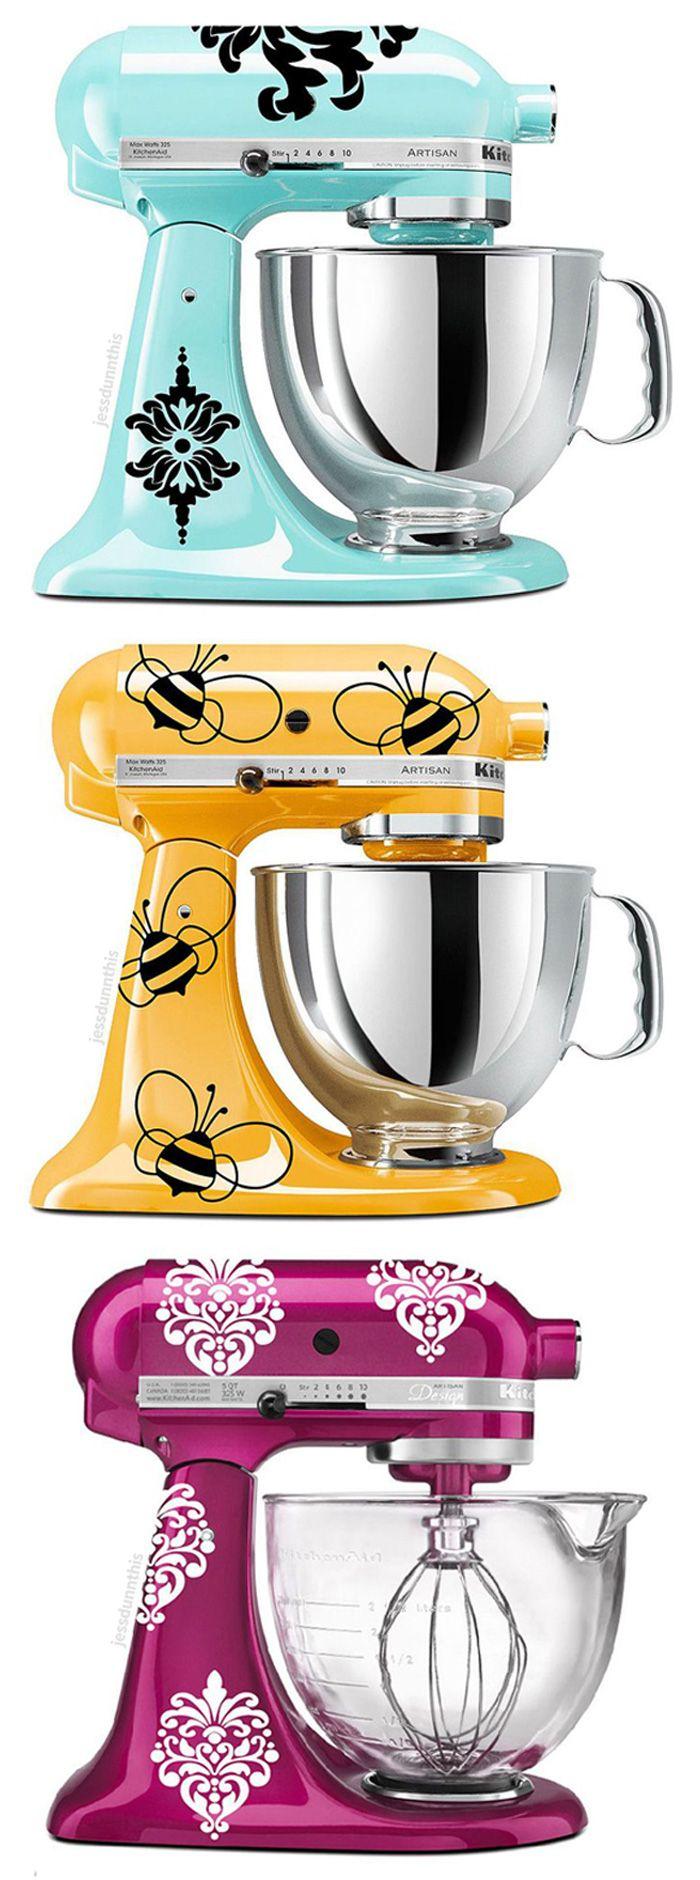 KitchenAid Mixer decals - love this idea! #product_design